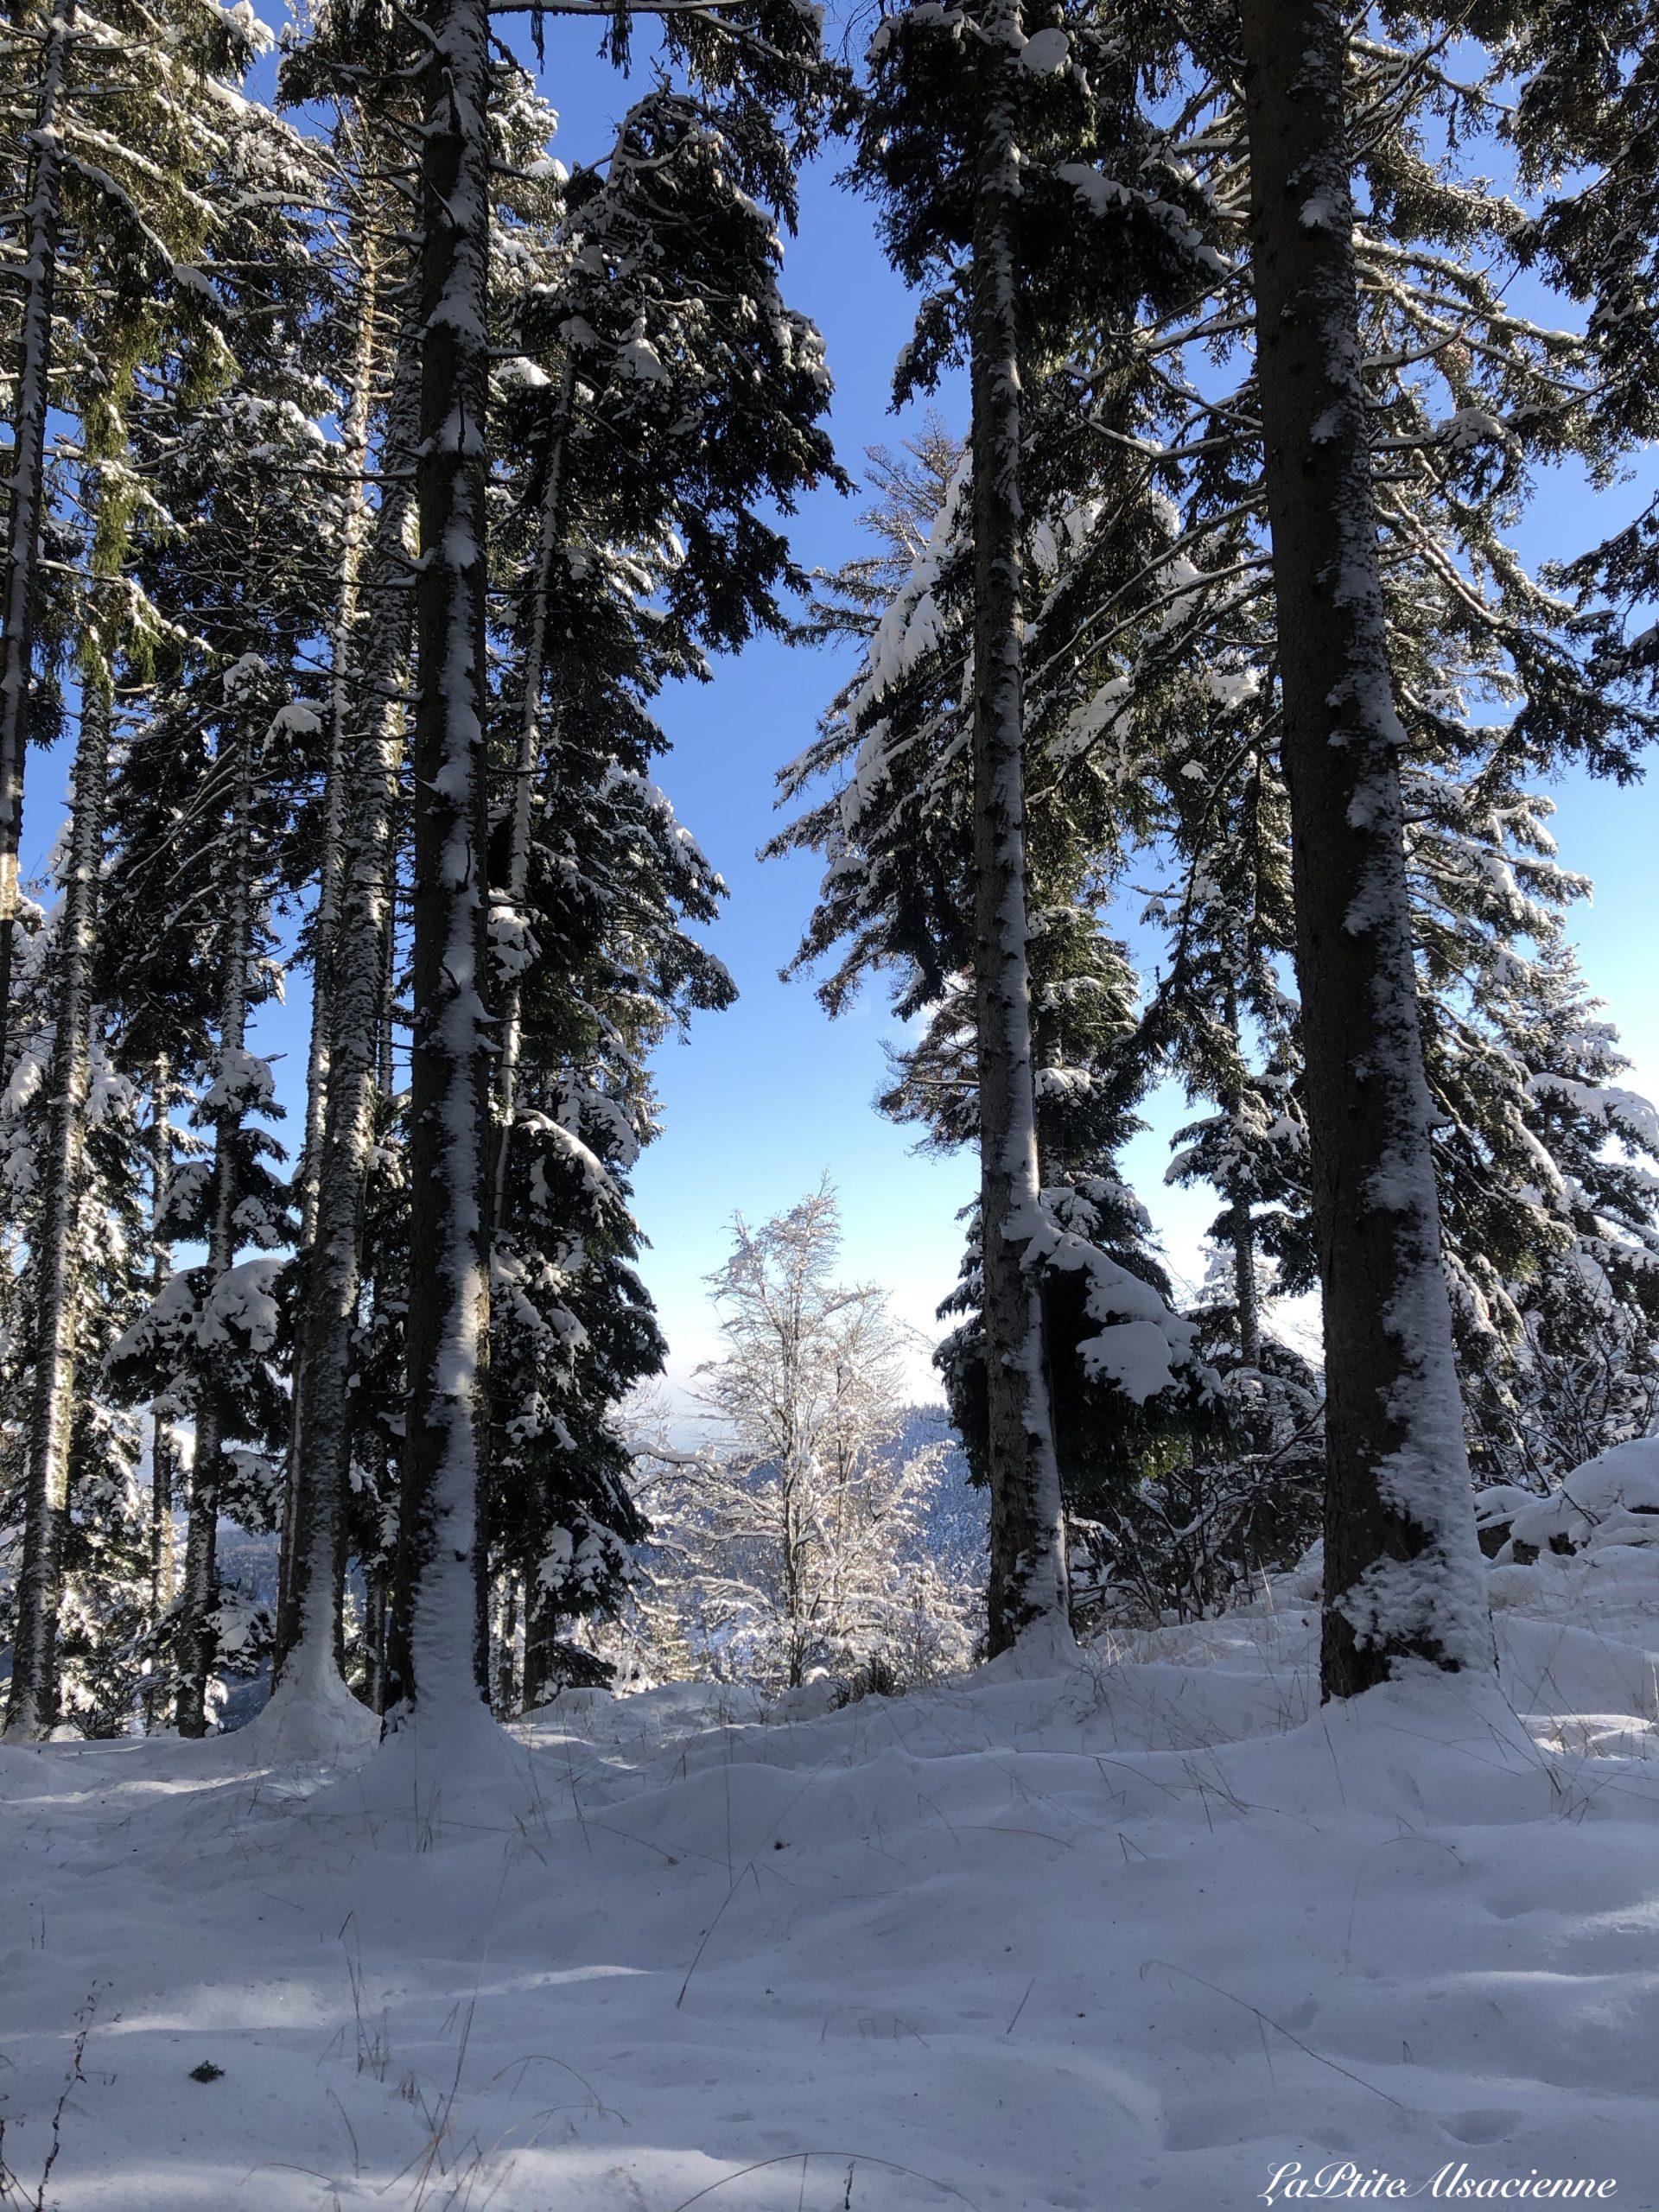 arbres enneige et ciel bleu vers lieserwasen et judenhut